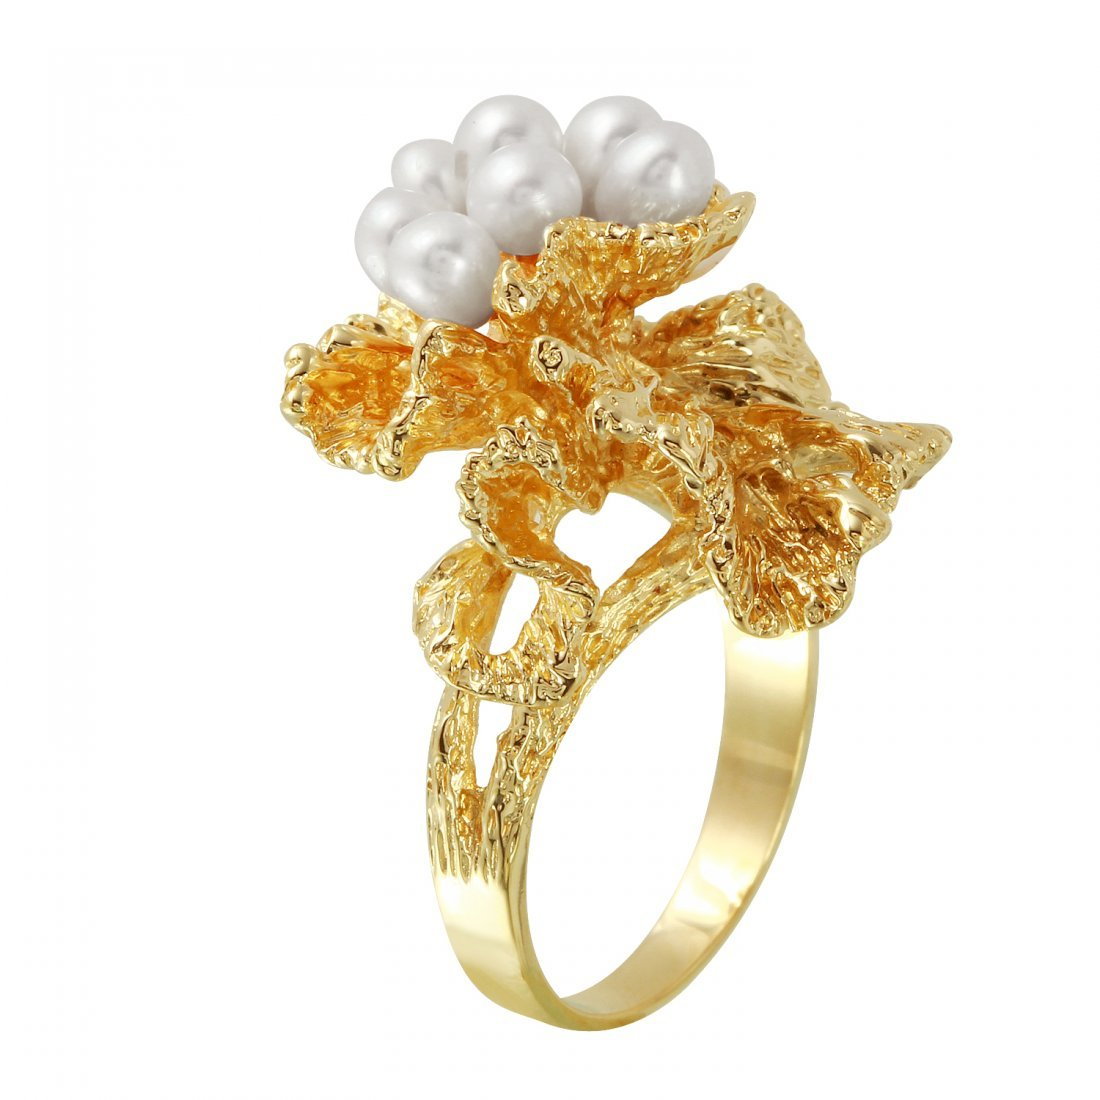 Ladies 3-4MM Freshwater Pearl 14K Yellow Gold Ring - 2